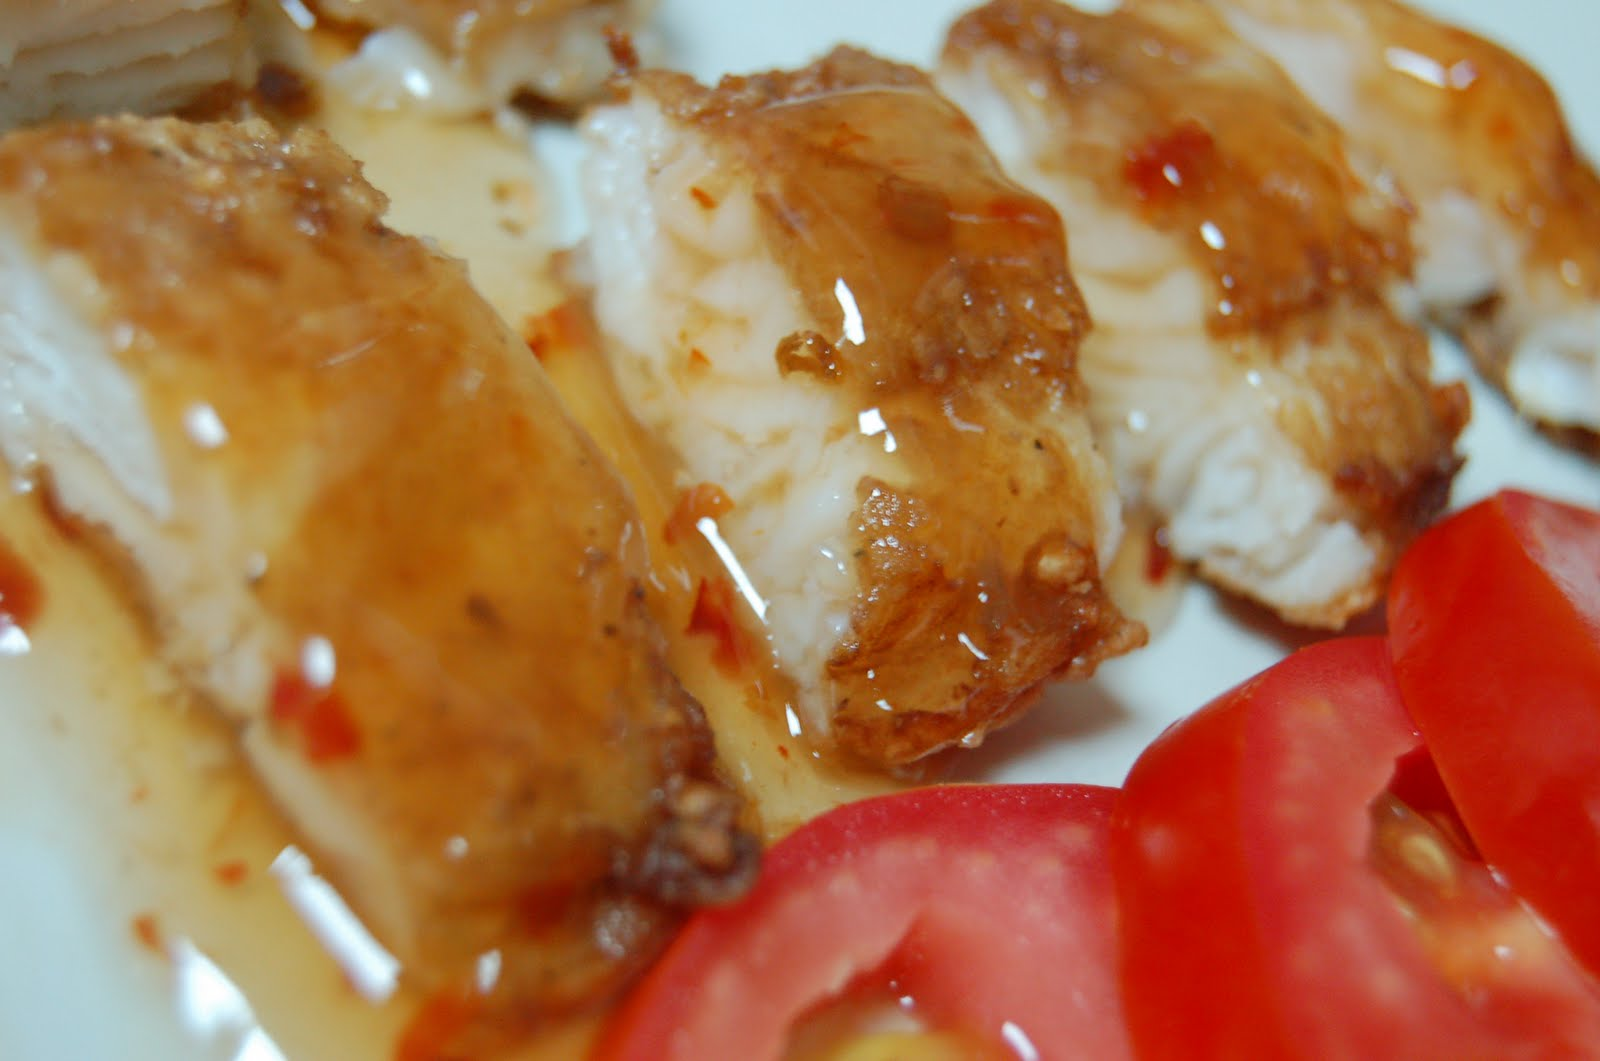 Eden 39 s easy recipes fried fish fillet for Fried fish fillet recipes